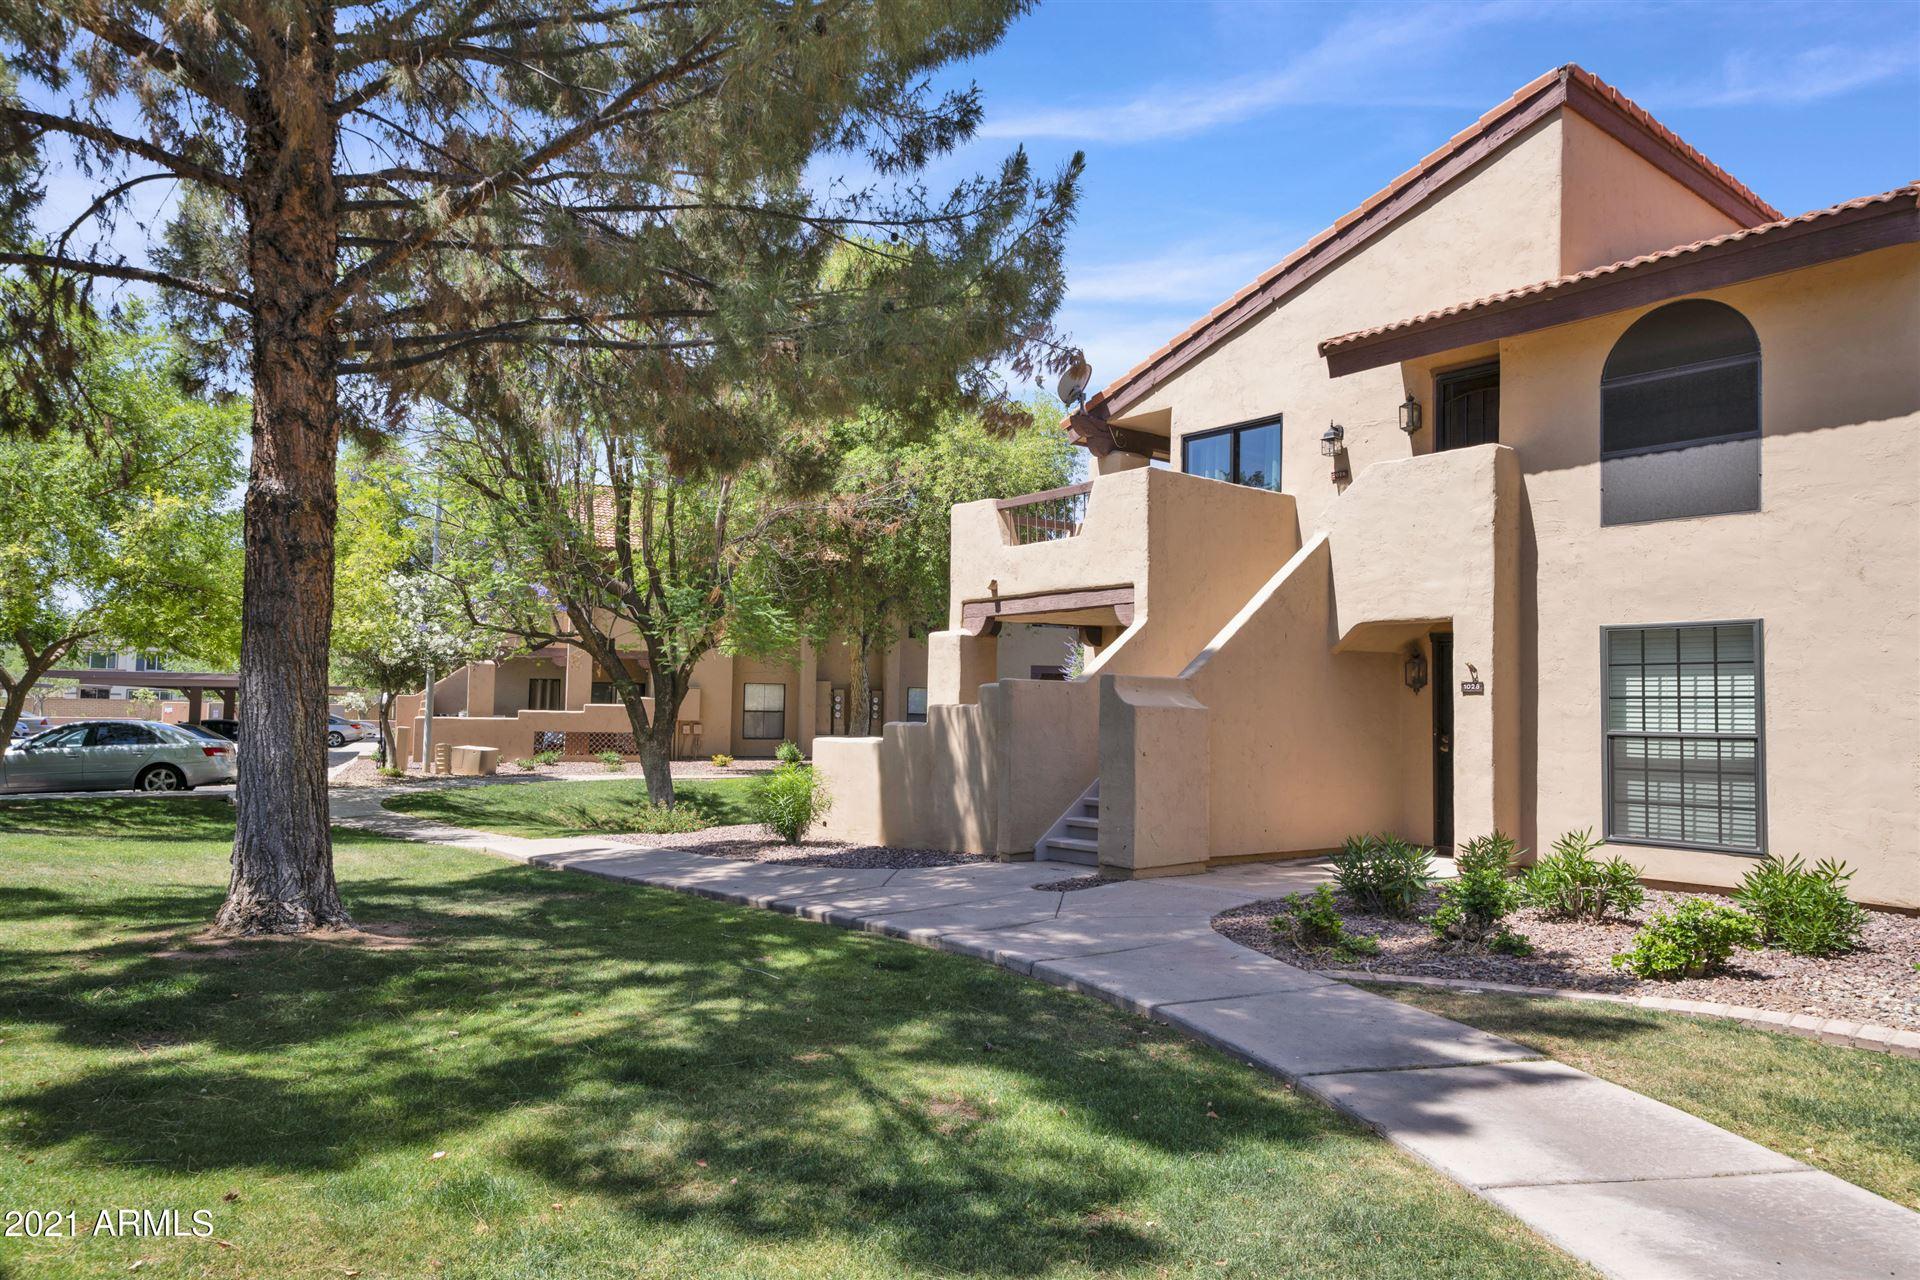 Photo of 1351 N PLEASANT Drive #2028, Chandler, AZ 85225 (MLS # 6231164)